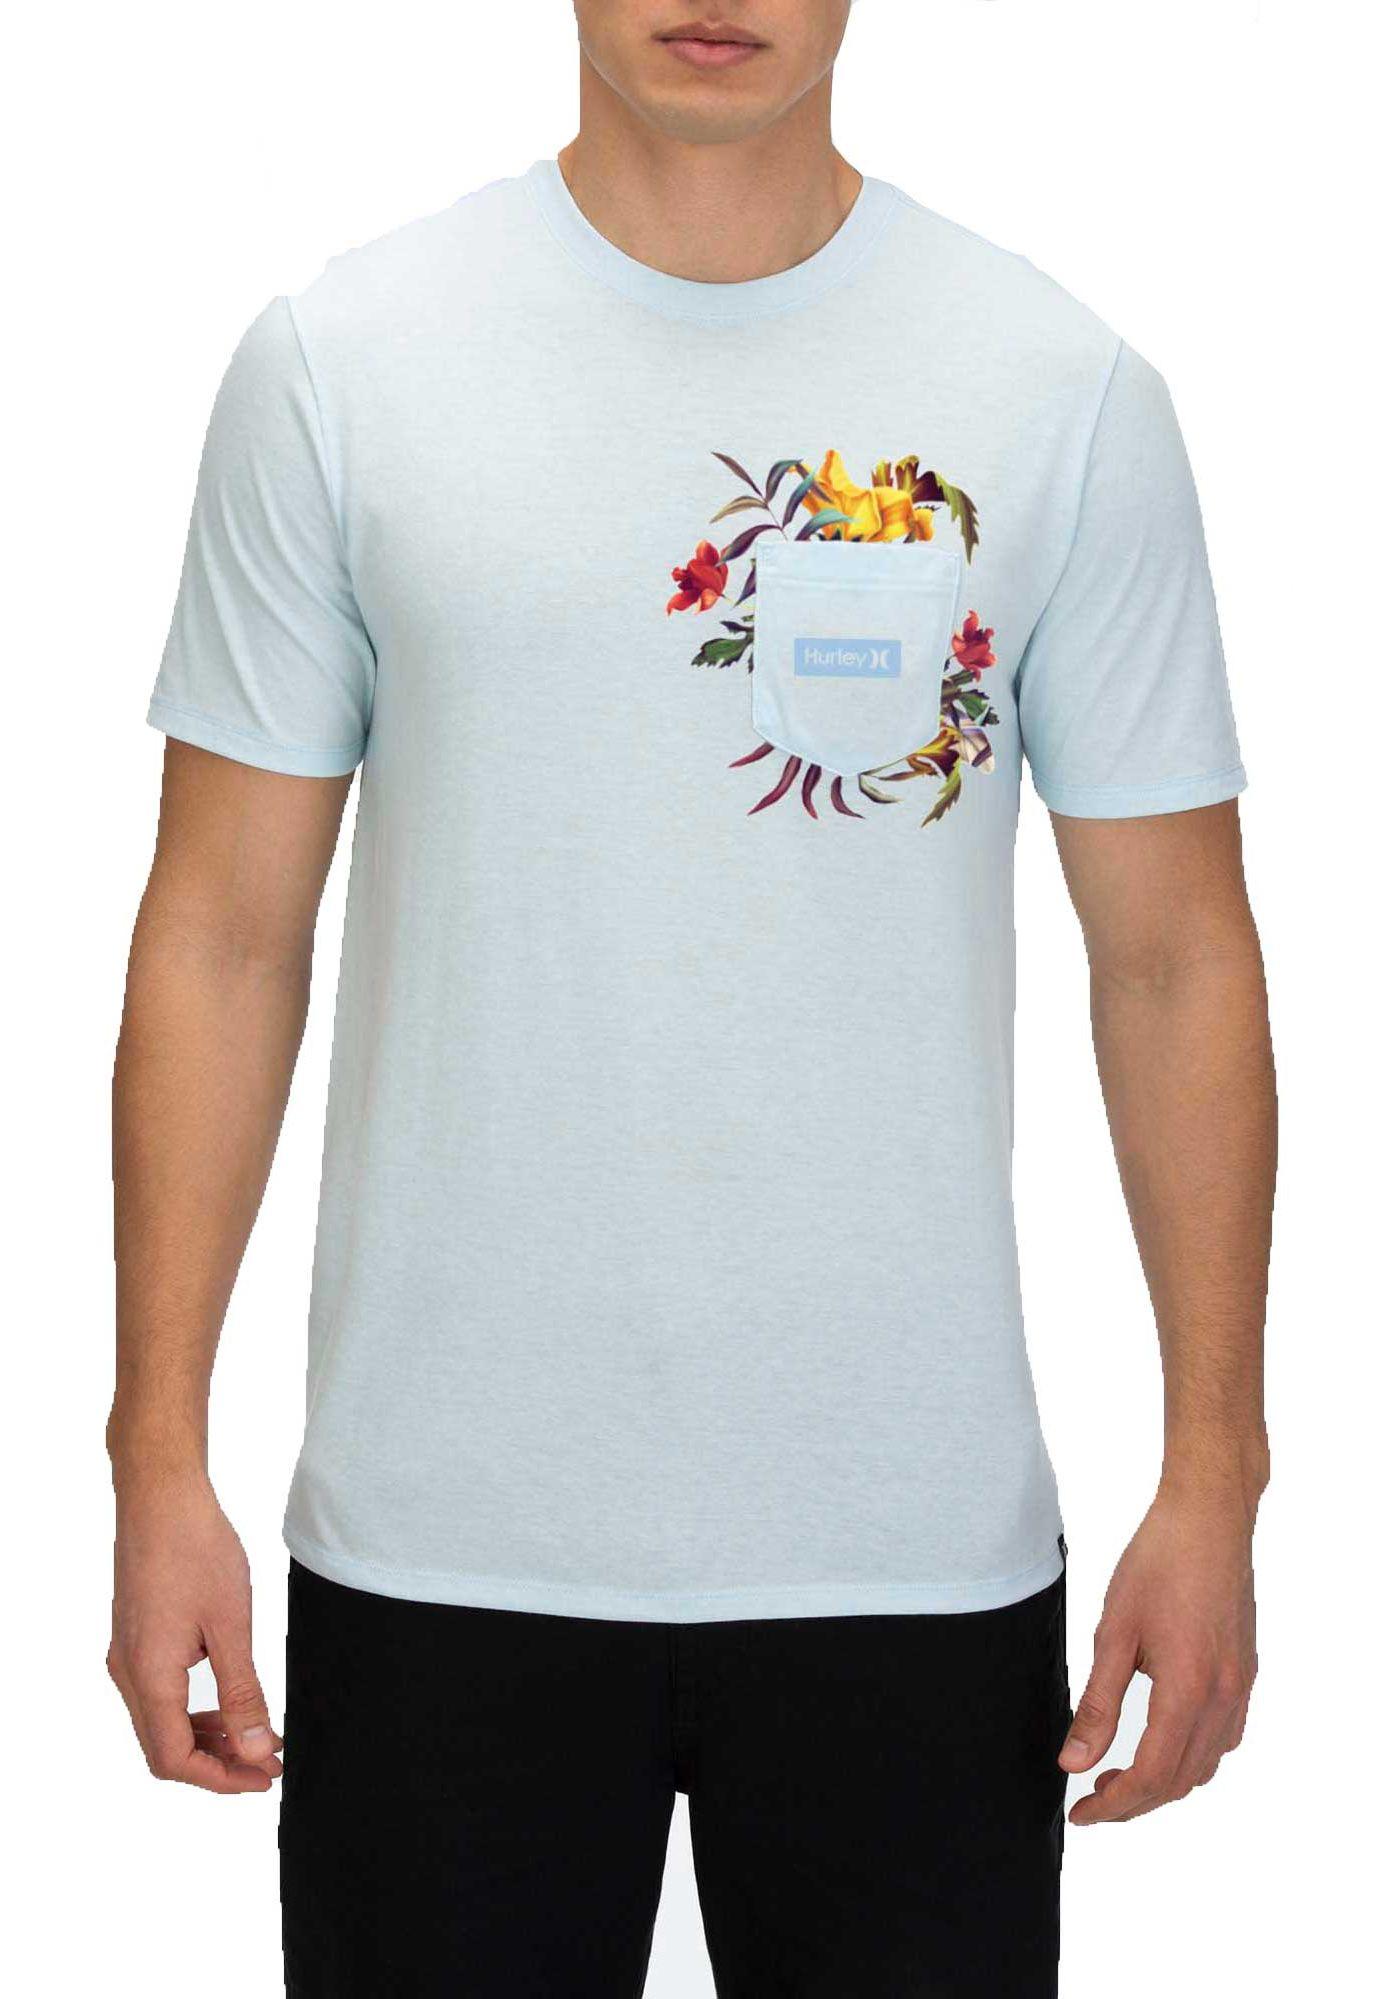 Hurley Men's Premium Fatcap Pocket Short Sleeve T-Shirt